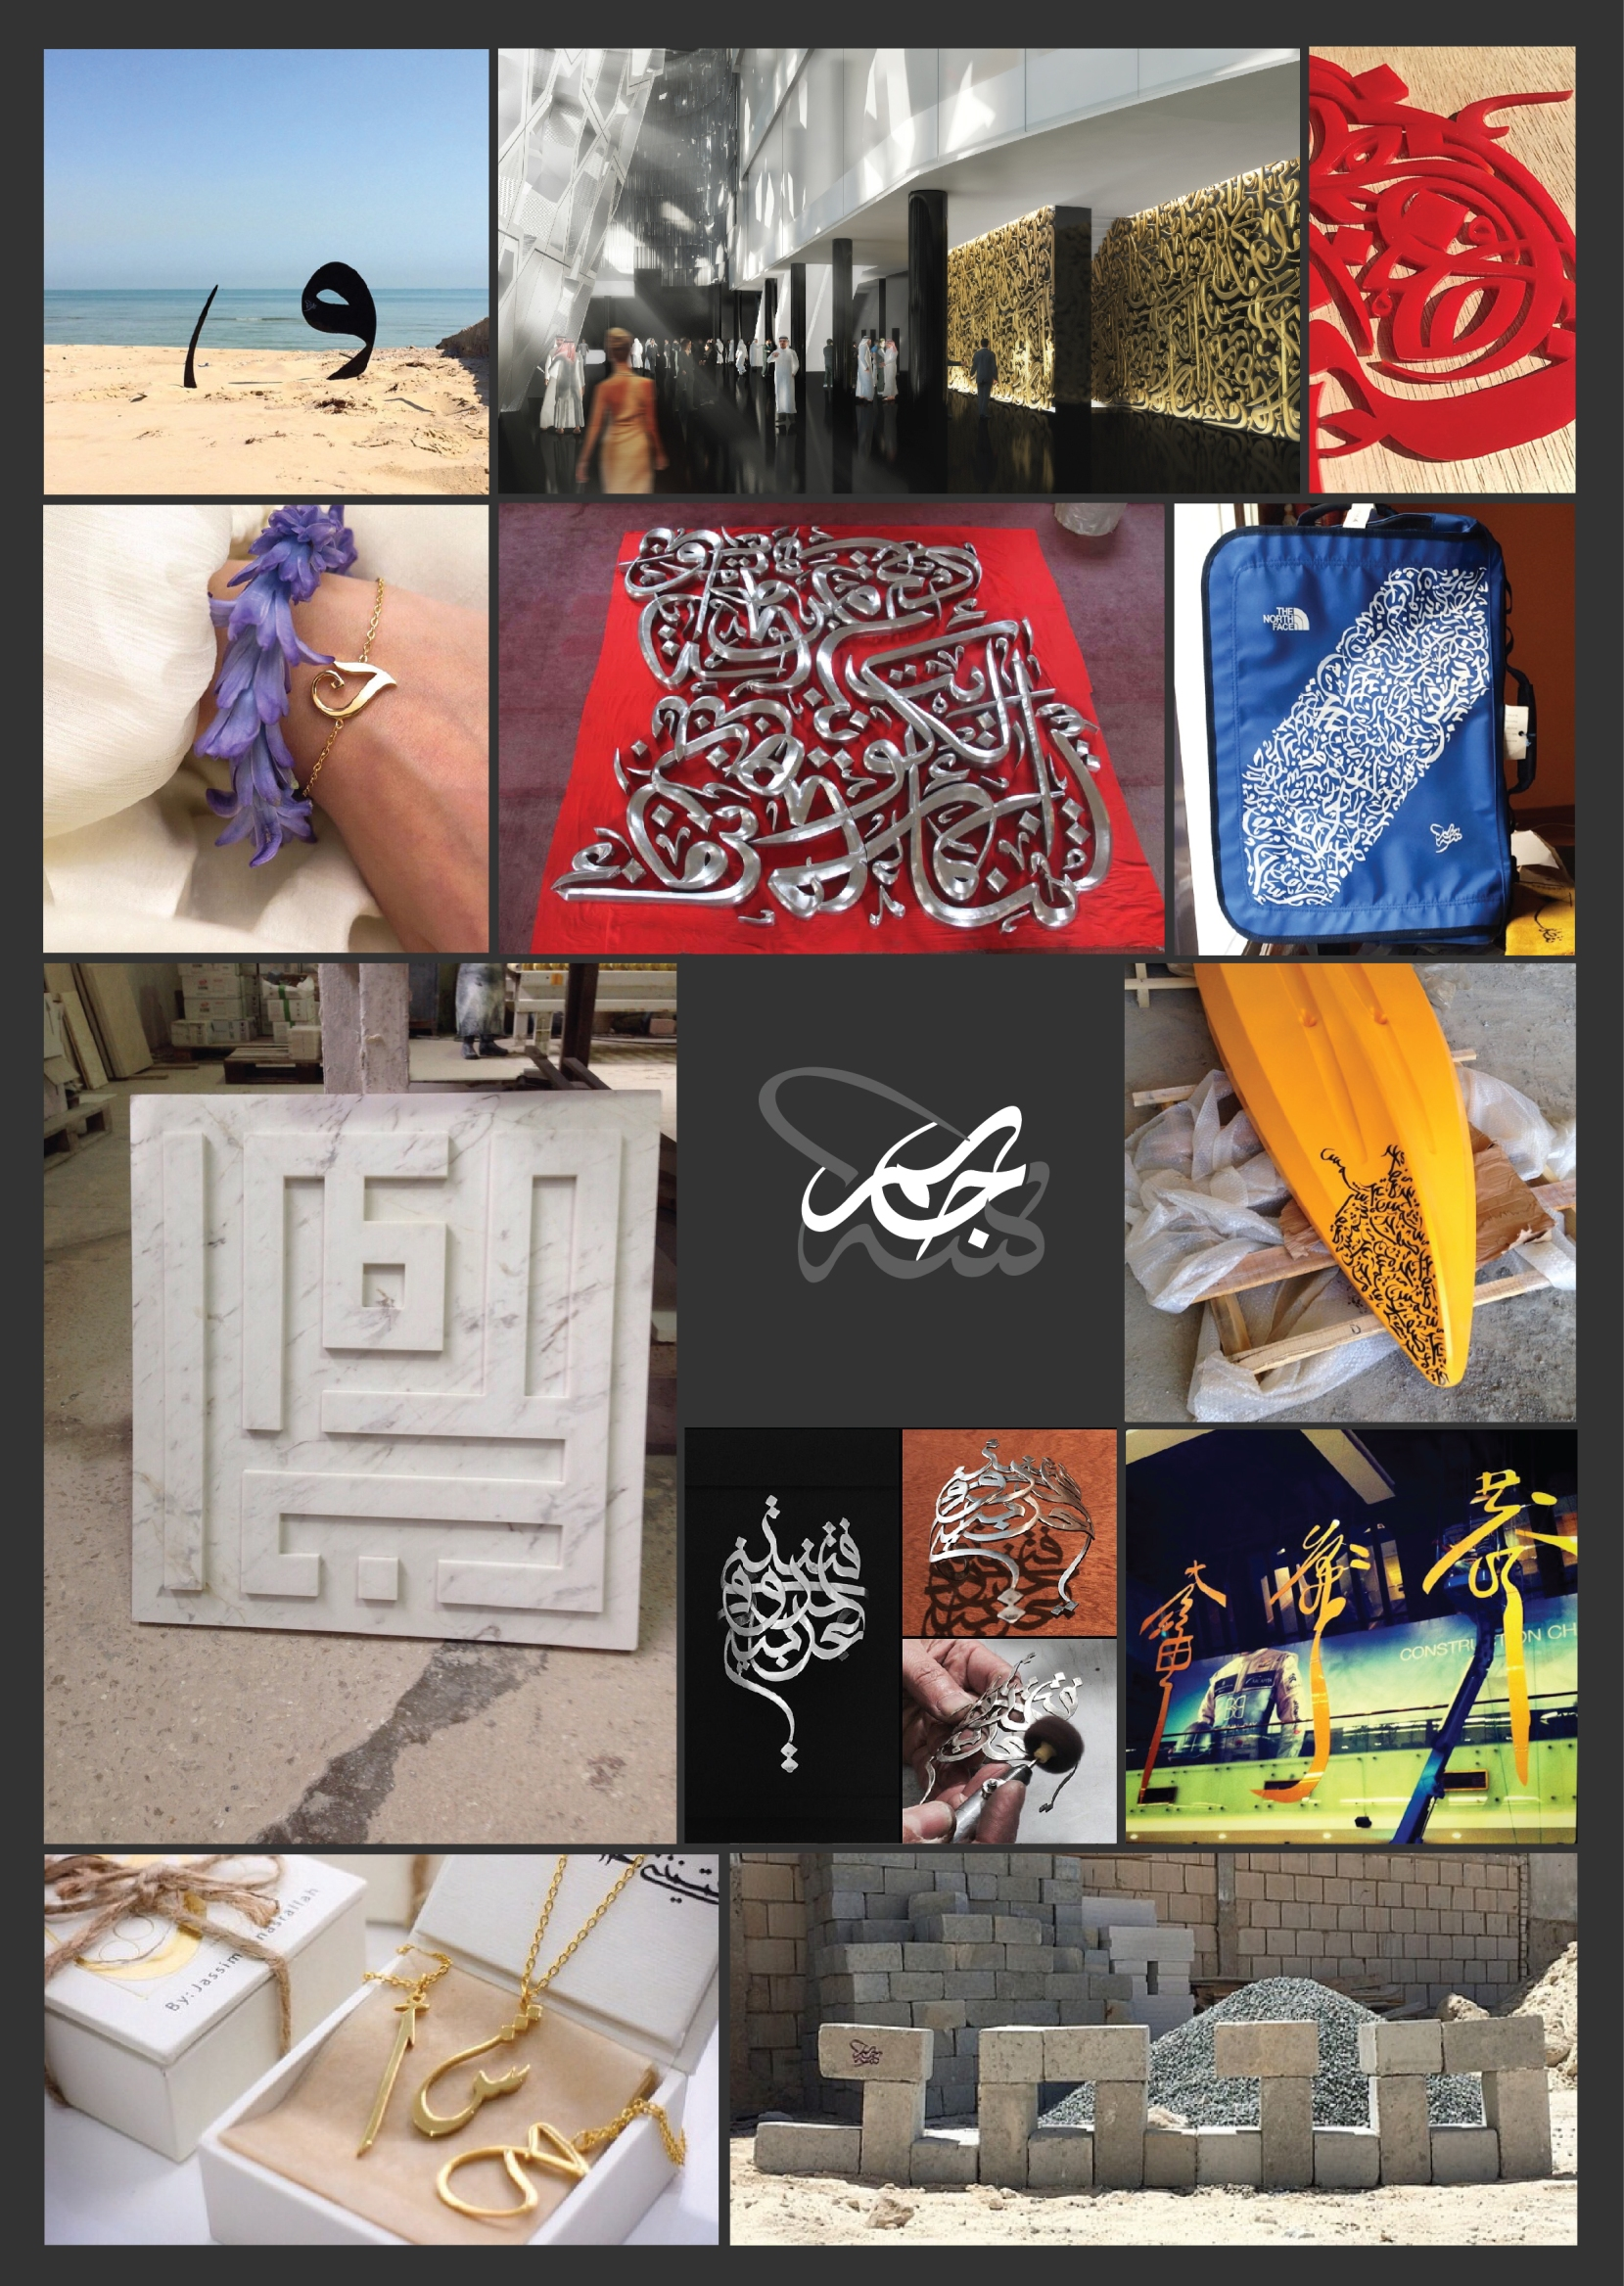 Sculptures Designs1.jpg